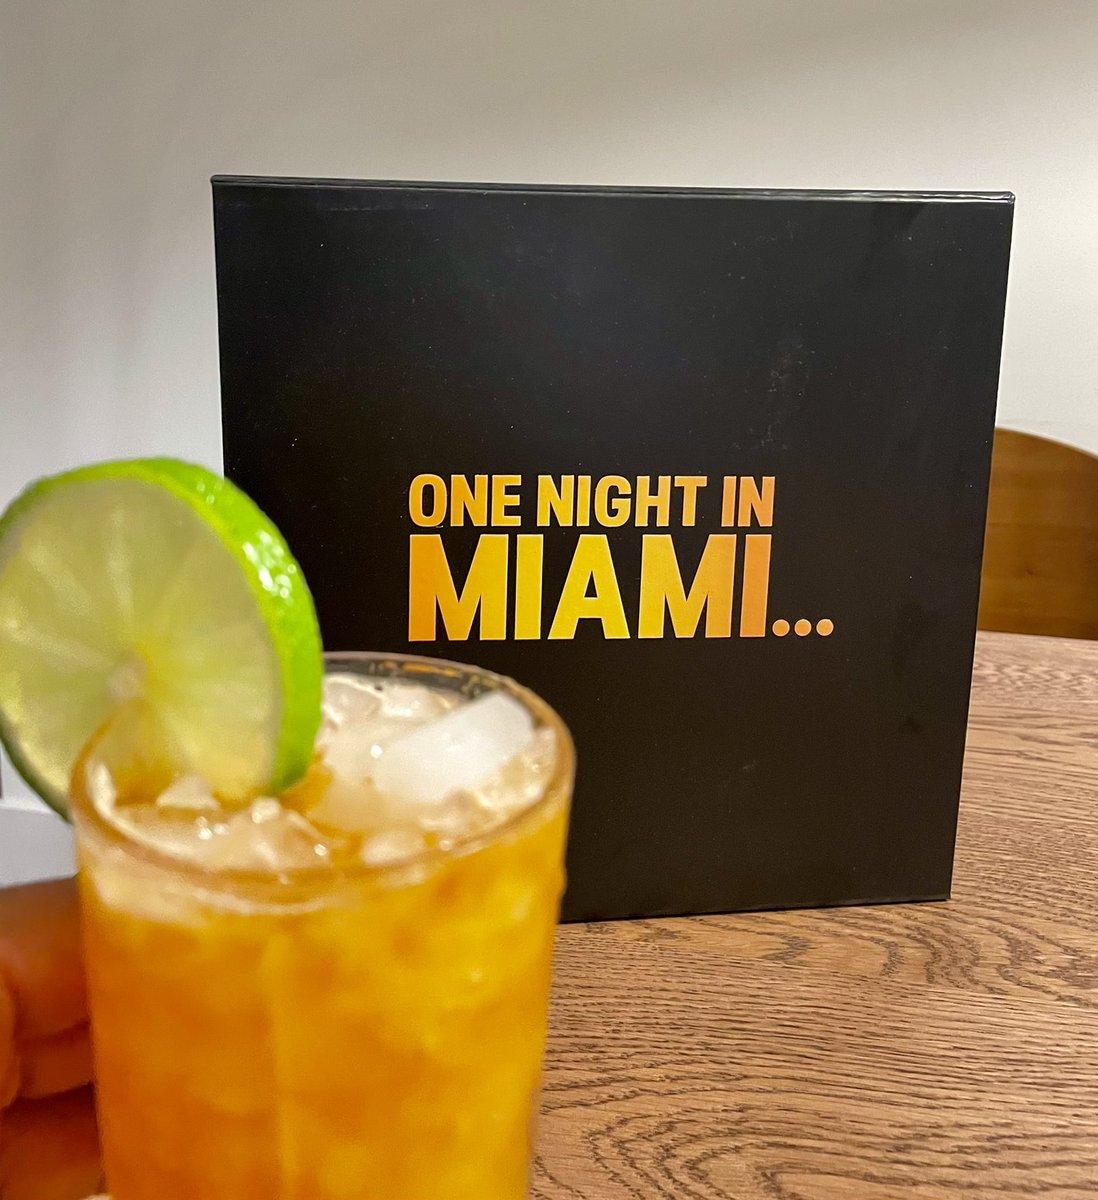 Miami Dark 'N Stormy... ✅ #OneNightInMiami